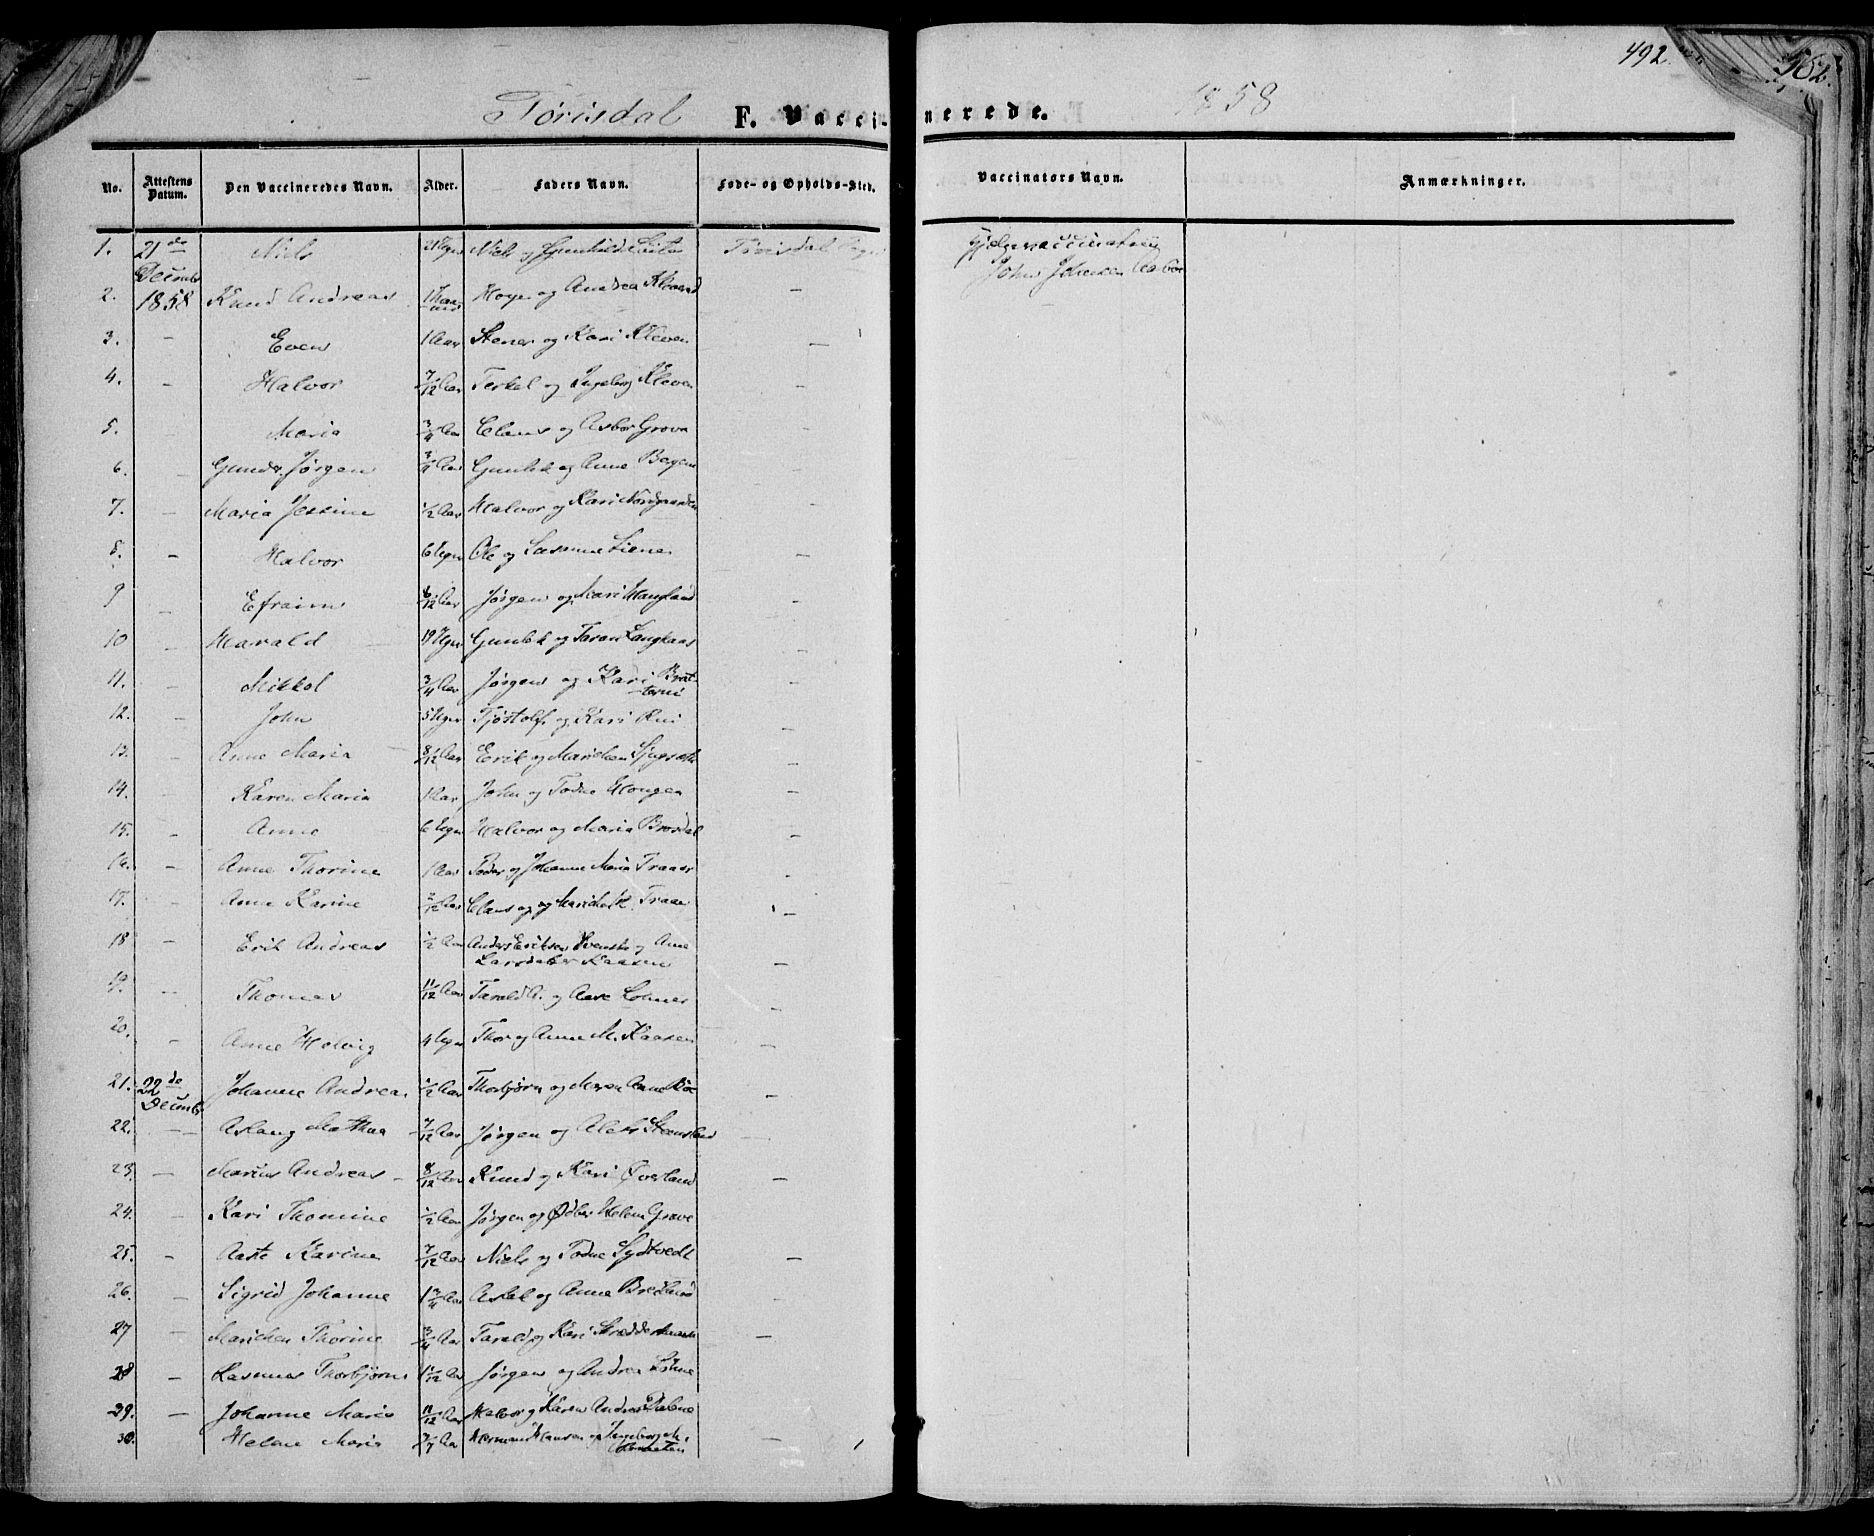 SAKO, Drangedal kirkebøker, F/Fa/L0008: Ministerialbok nr. 8, 1857-1871, s. 492